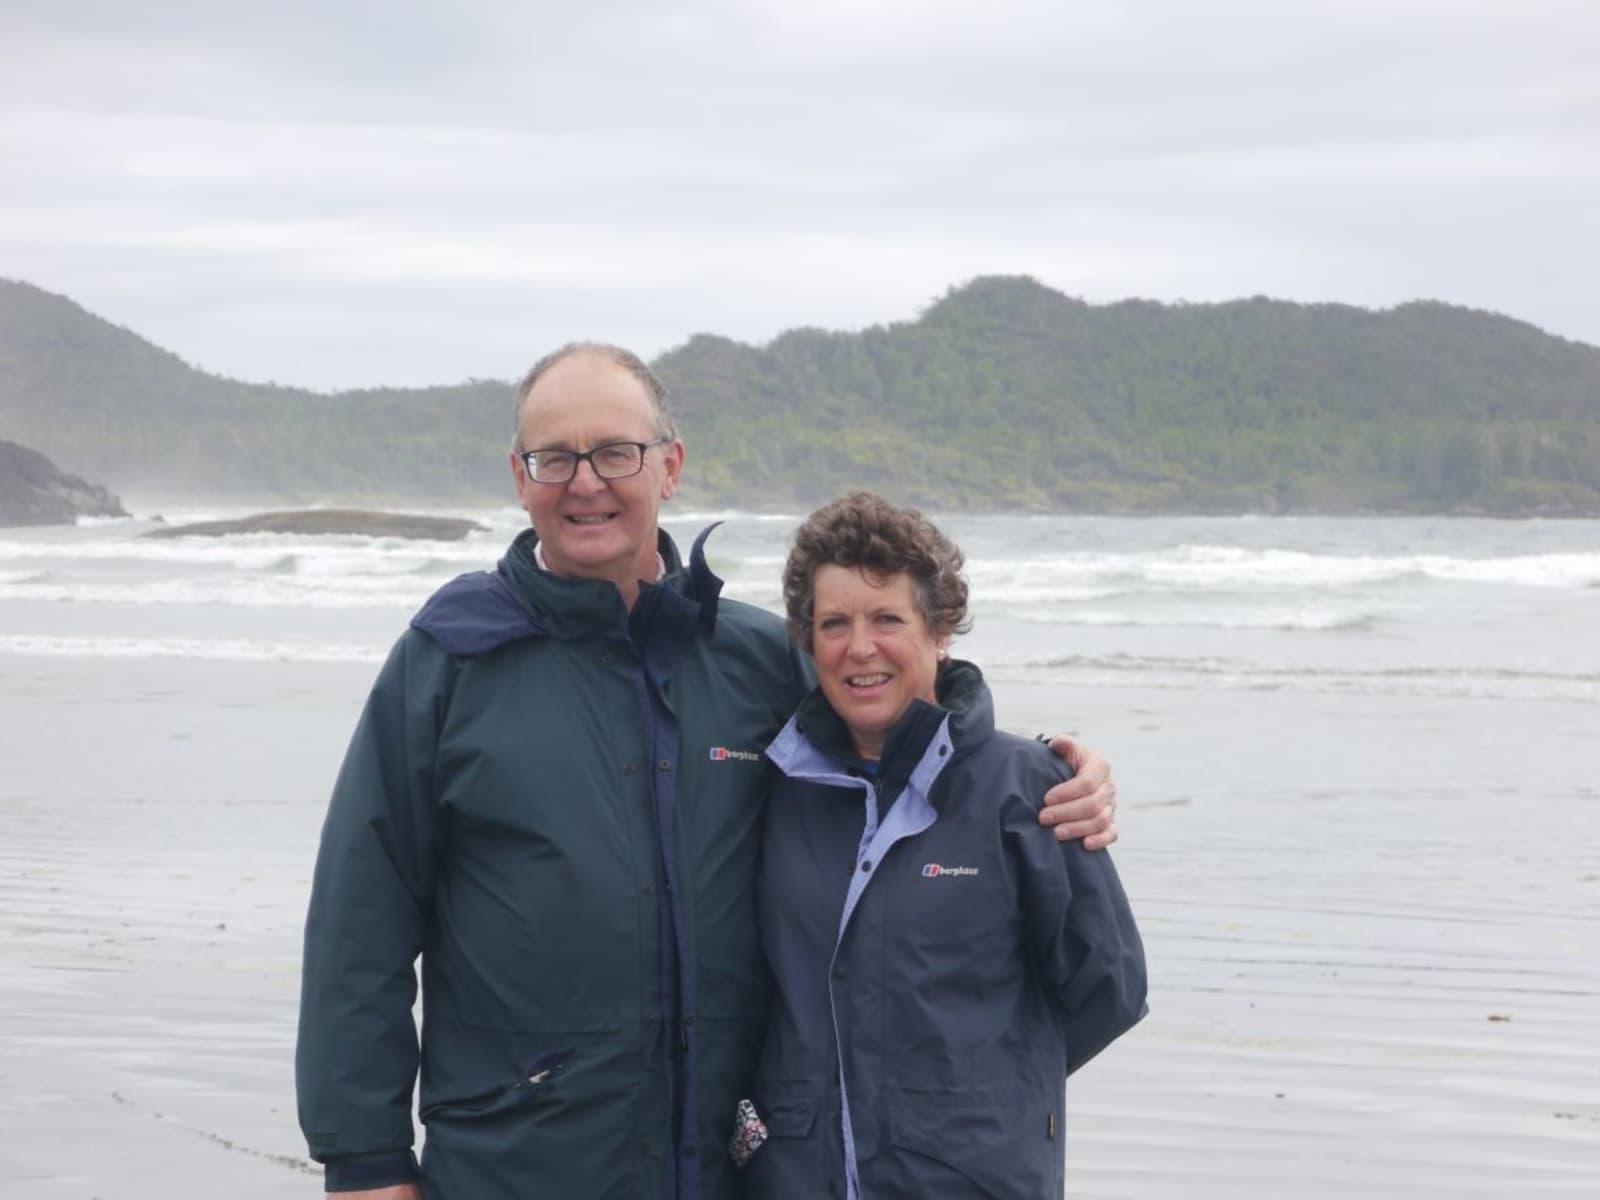 John & Lorraine from Nexon, France